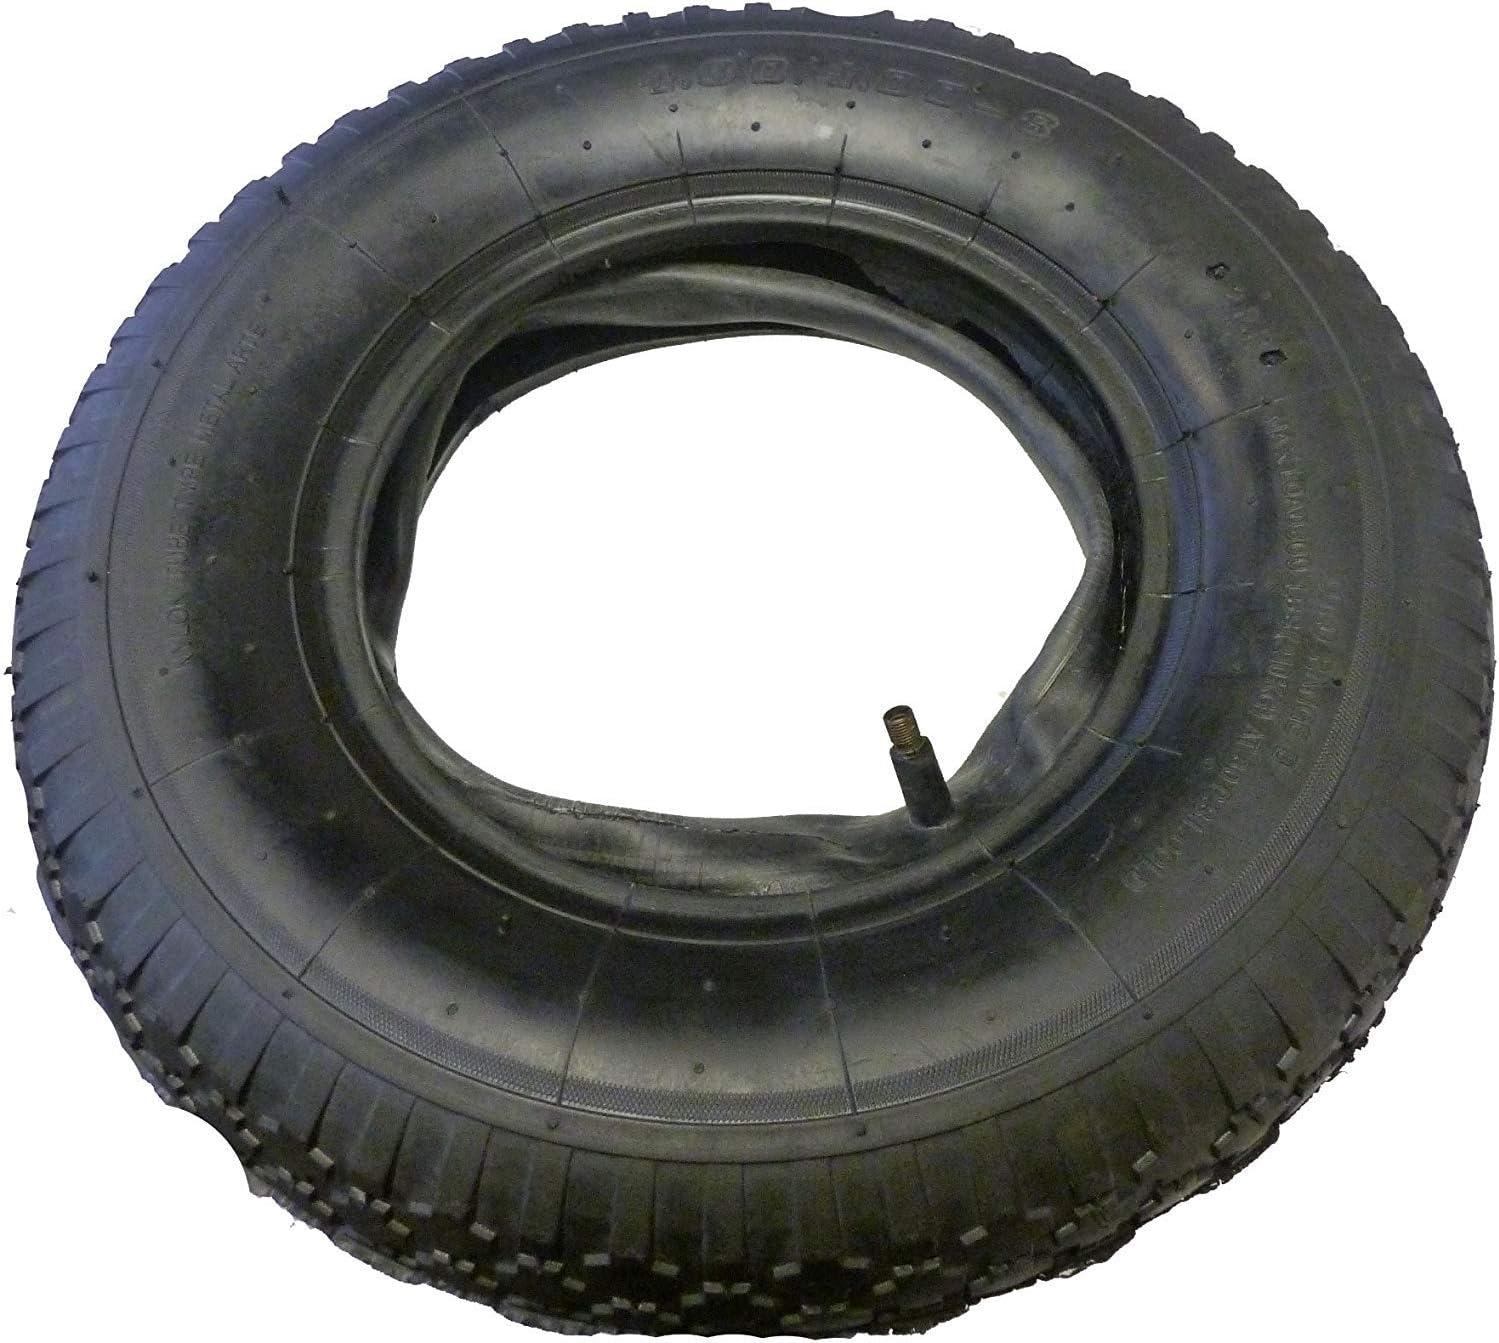 4.00-8 Inner Tube Tyres Bent Air Valve For Pneumatic Trolley Cart Wheel 4.80